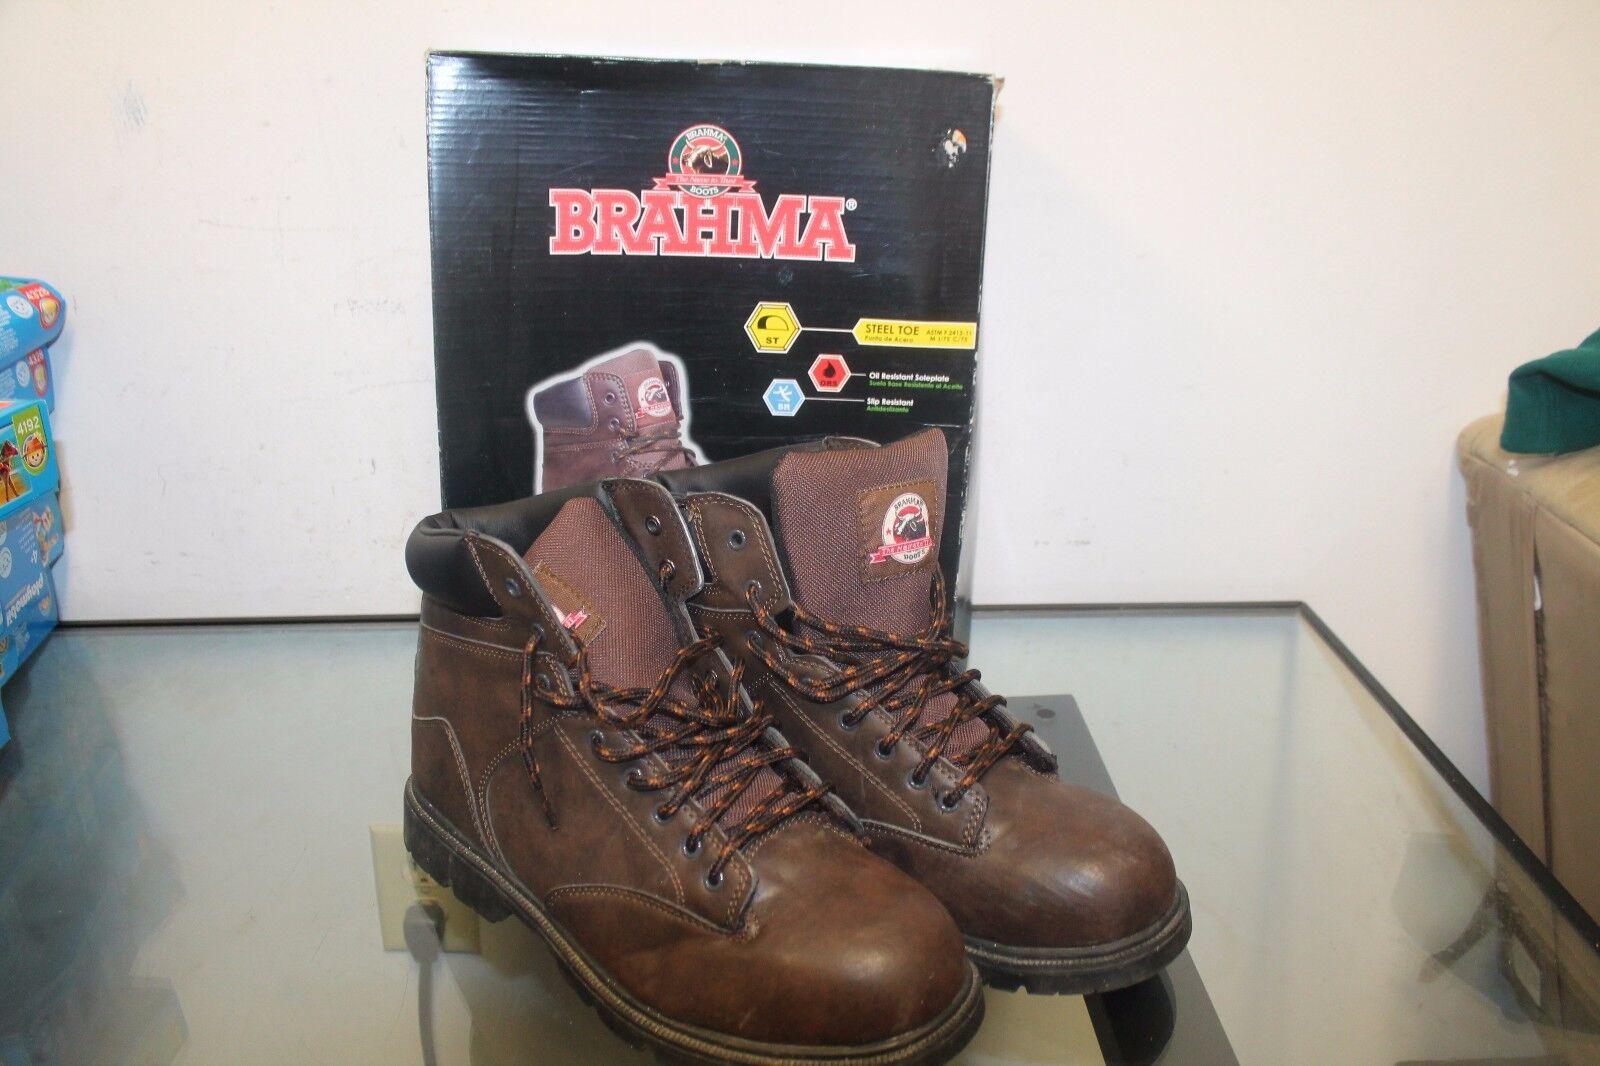 Brahma US Shoe Size 12 Men's Raid Steel Toe Work Boot Brown Slip-resistant